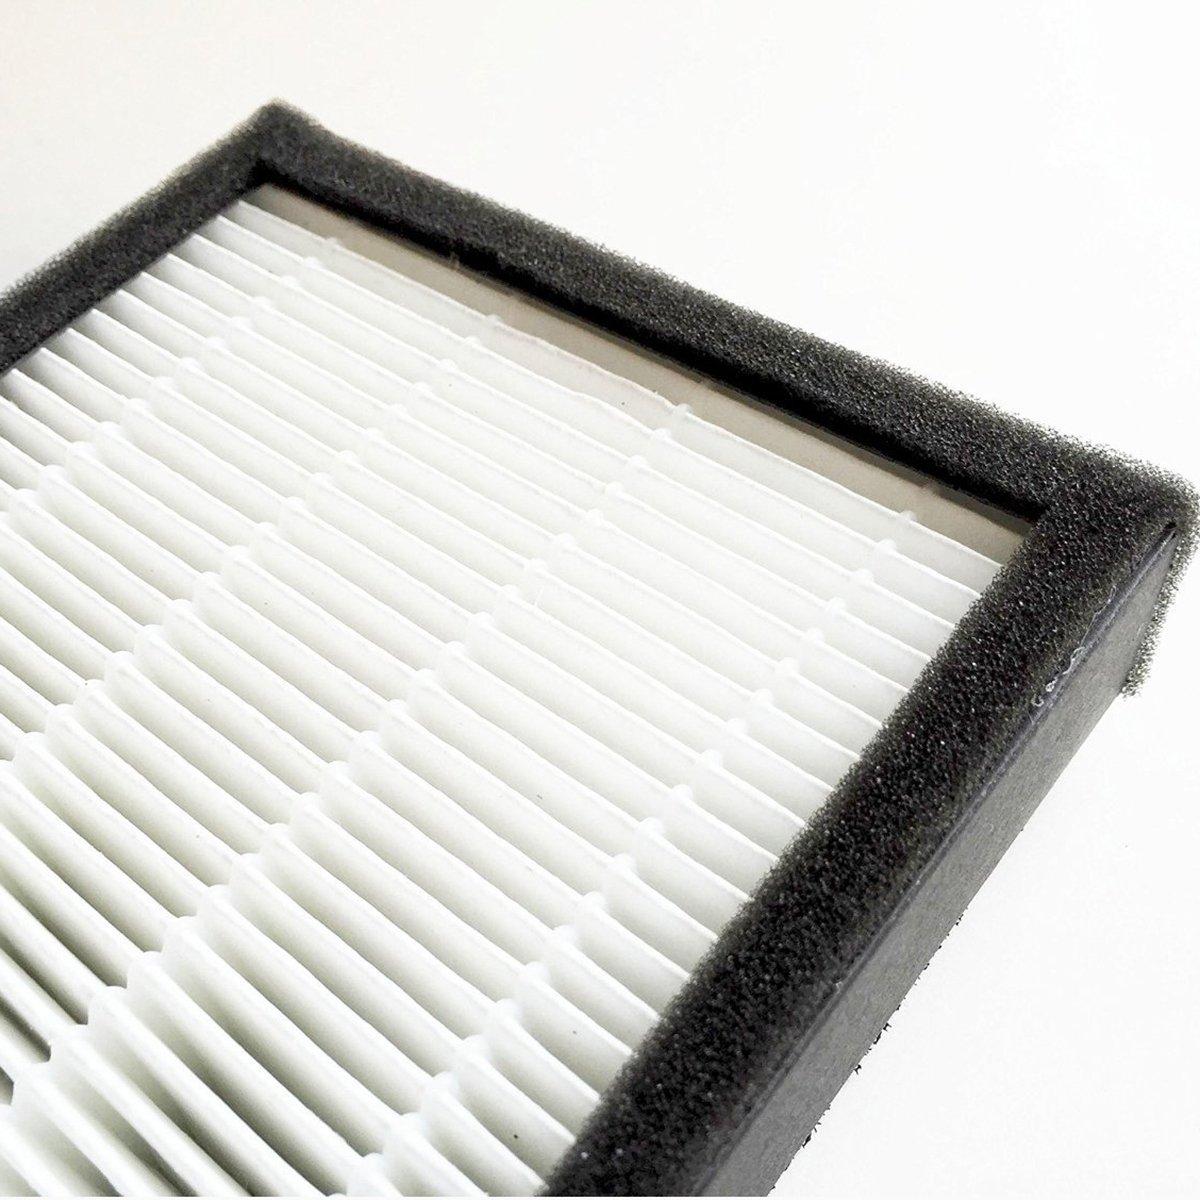 True HEPA + Pre Filter for GermGuardian Air Purifiers FLT5250 FLT5250PT Filter C for AC5000 Series Replacement HEPA + Pre Filter Fit Germ Guardian 5000 5111 5250 2pcs